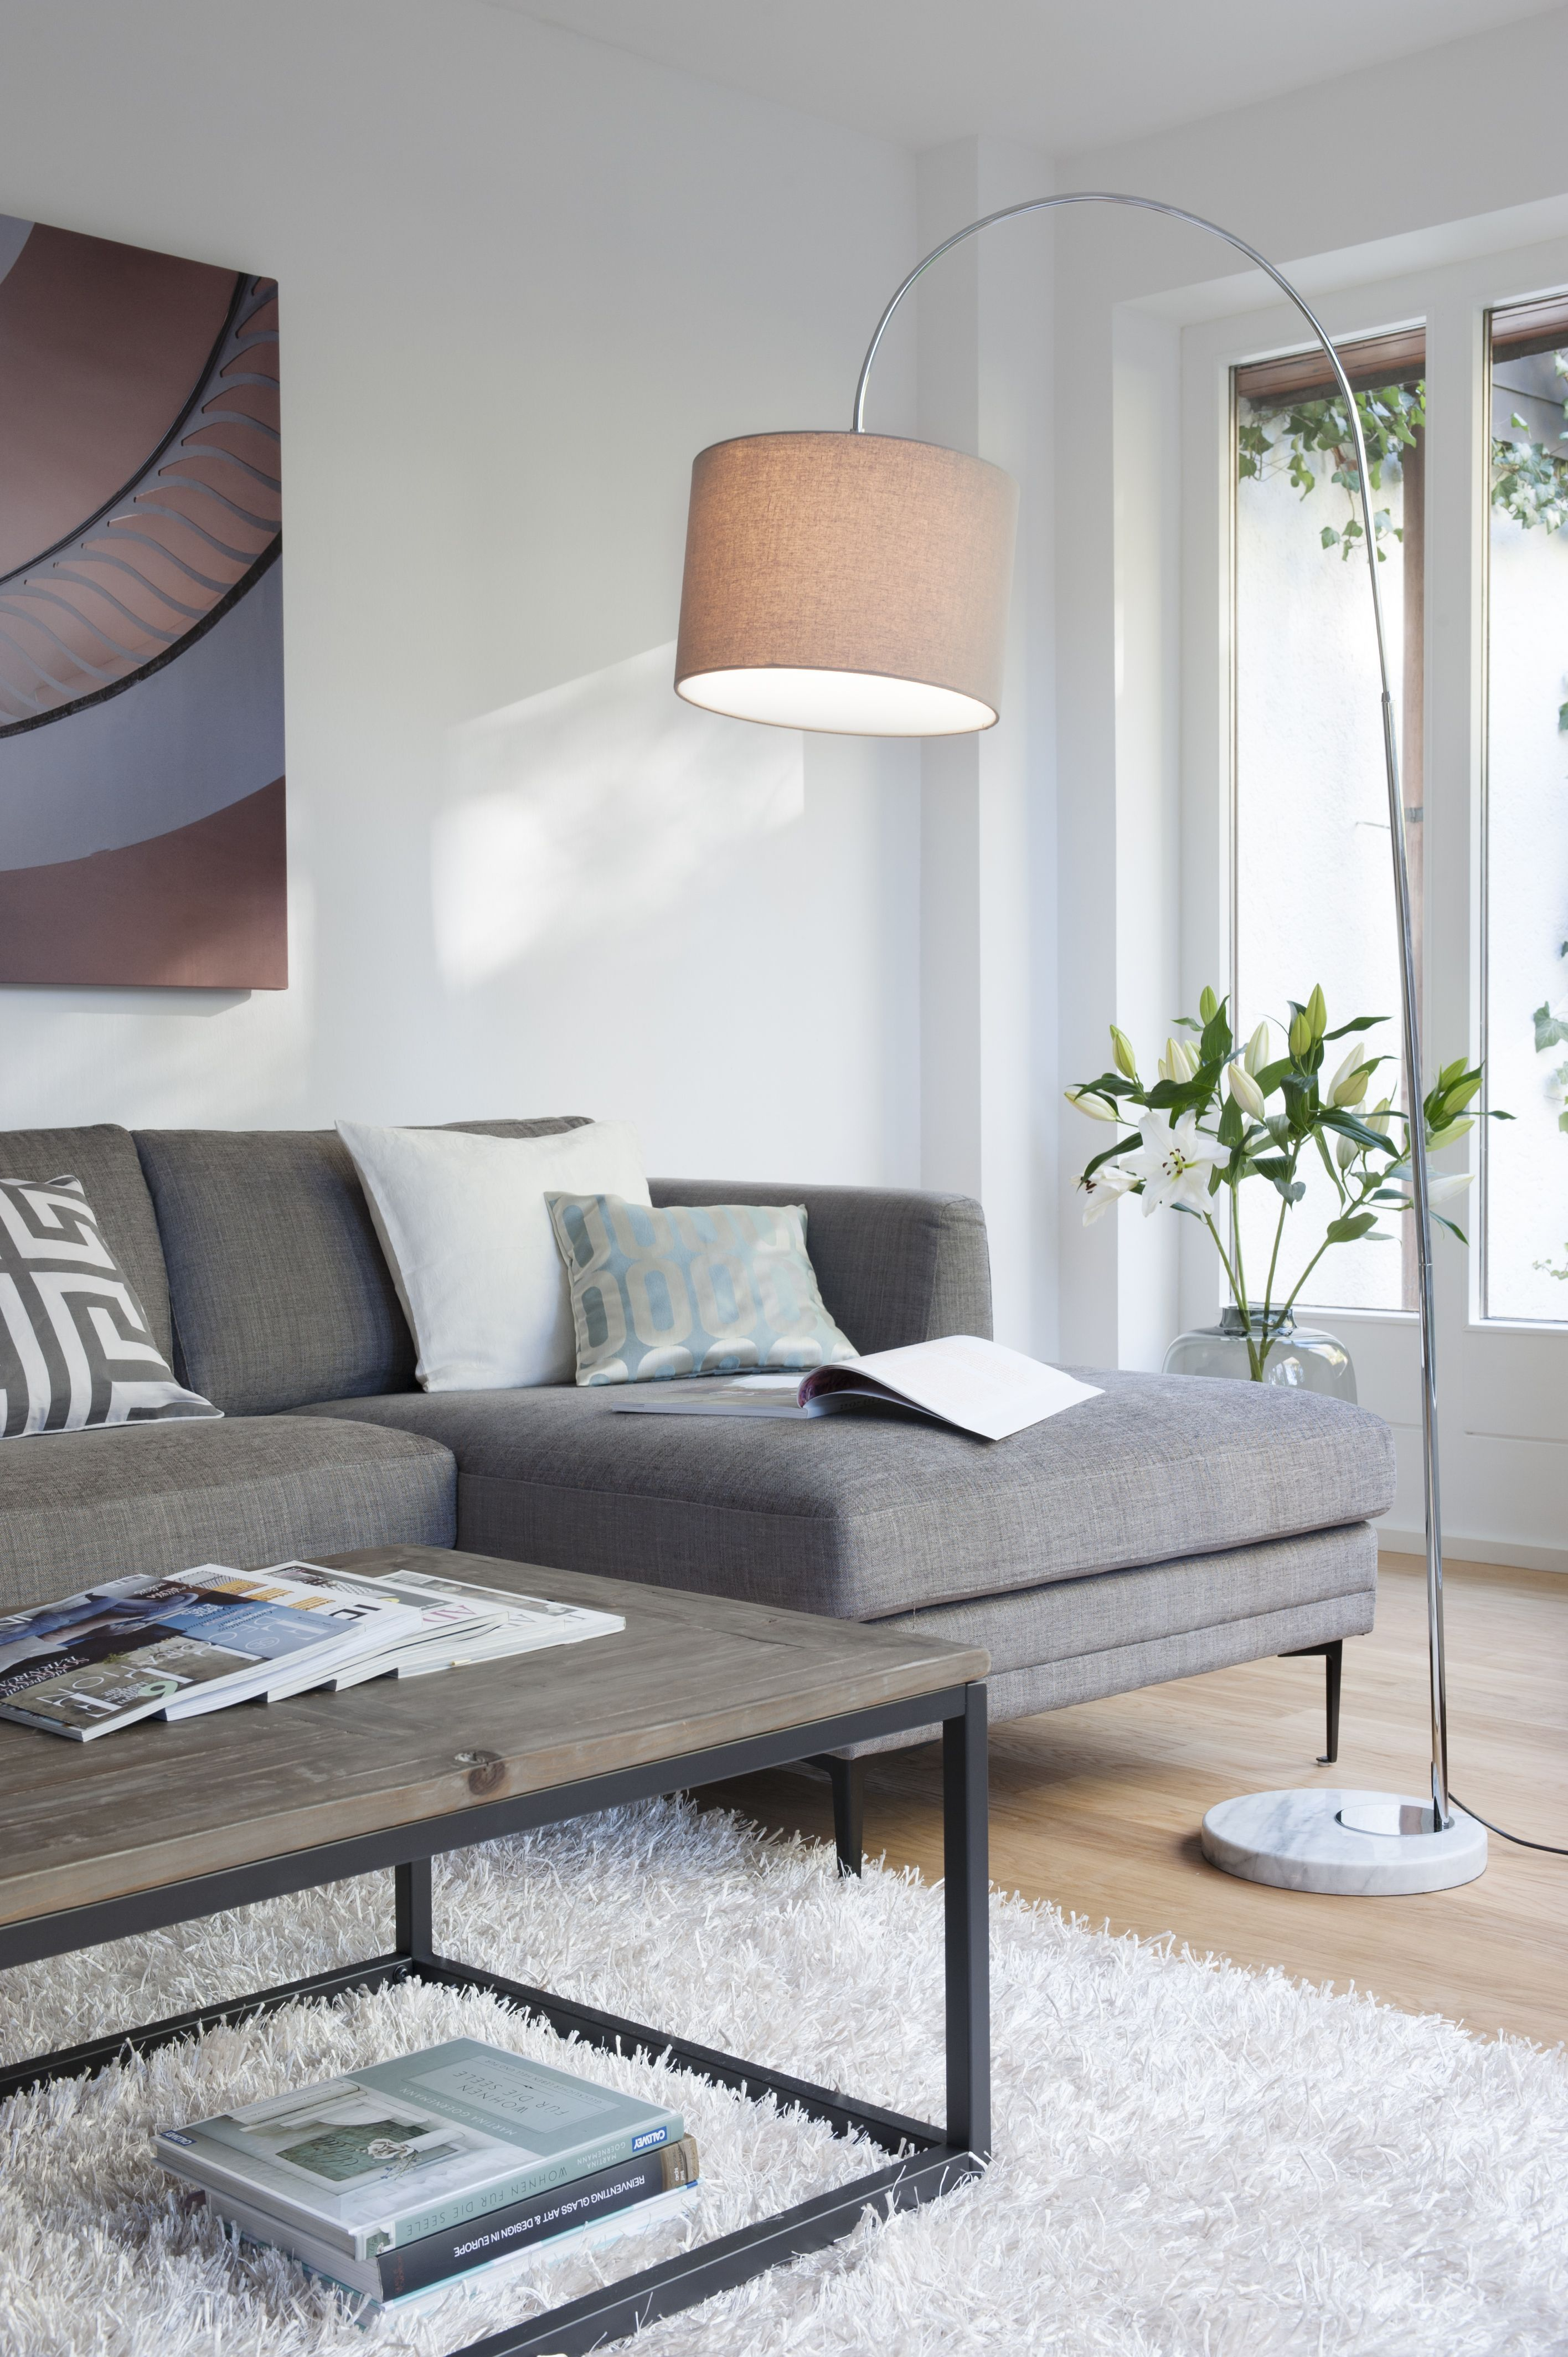 Monday update kw livingroom bohemian in pinterest living room decor and also rh